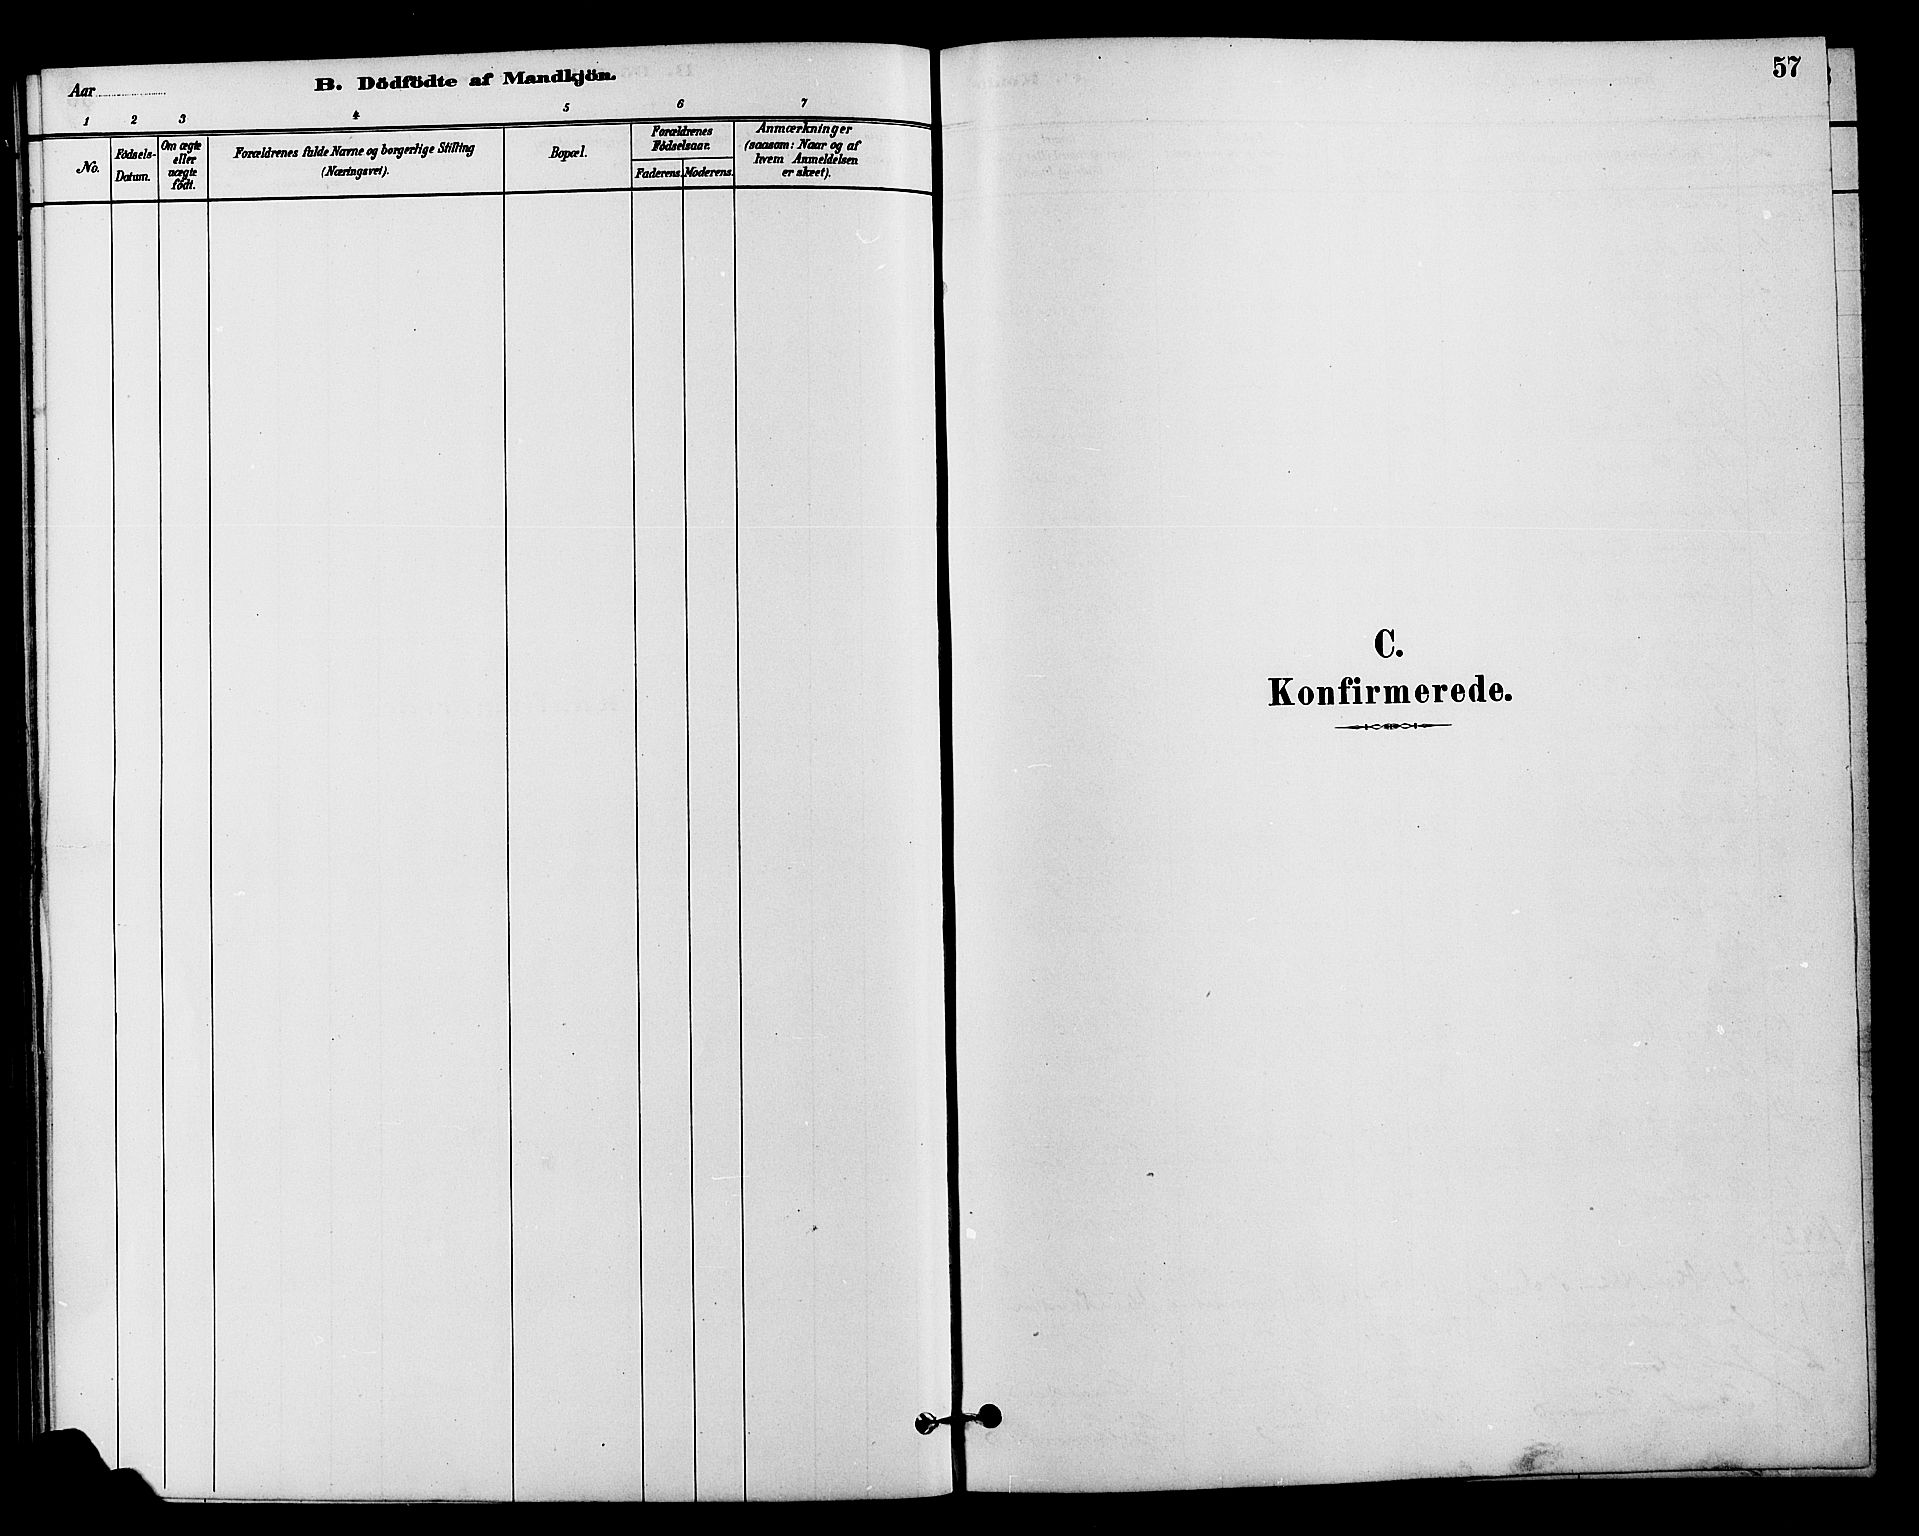 SAH, Vestre Slidre prestekontor, Klokkerbok nr. 4, 1881-1912, s. 57